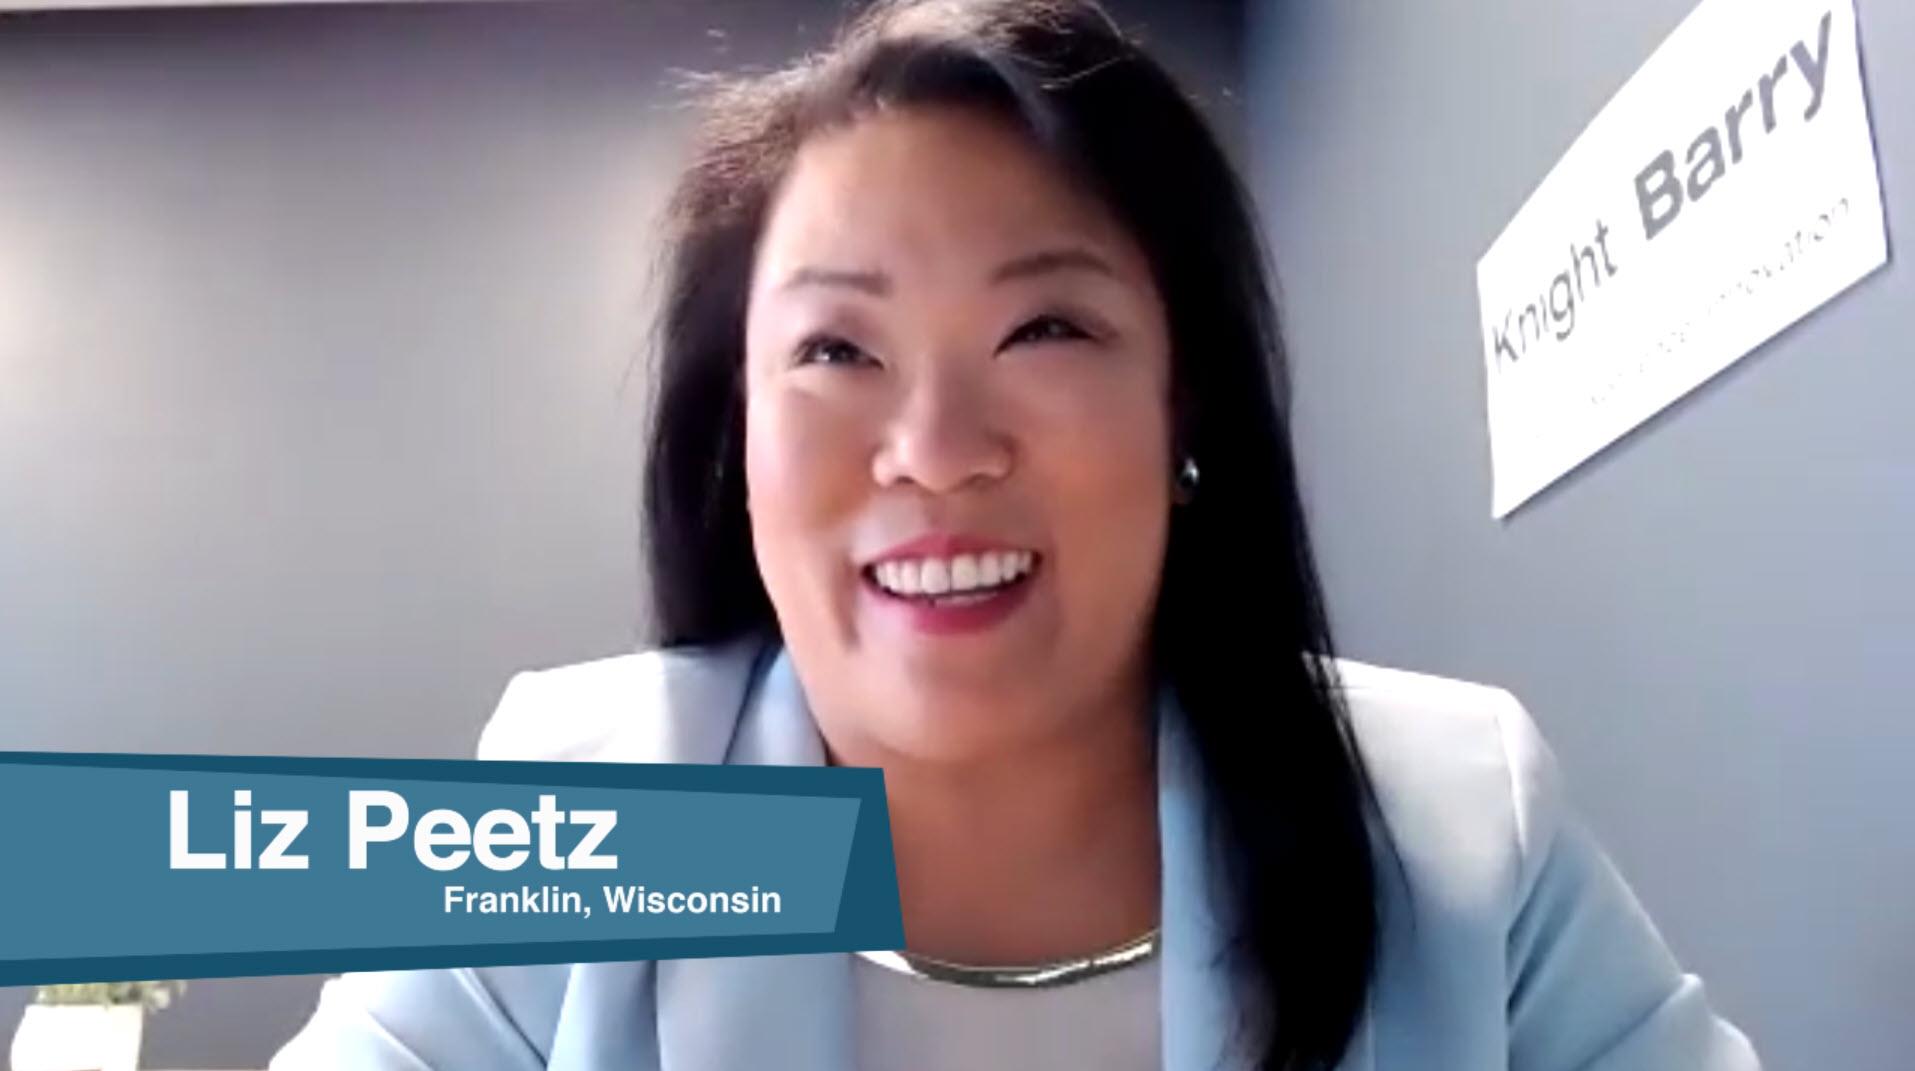 Liz Peetz